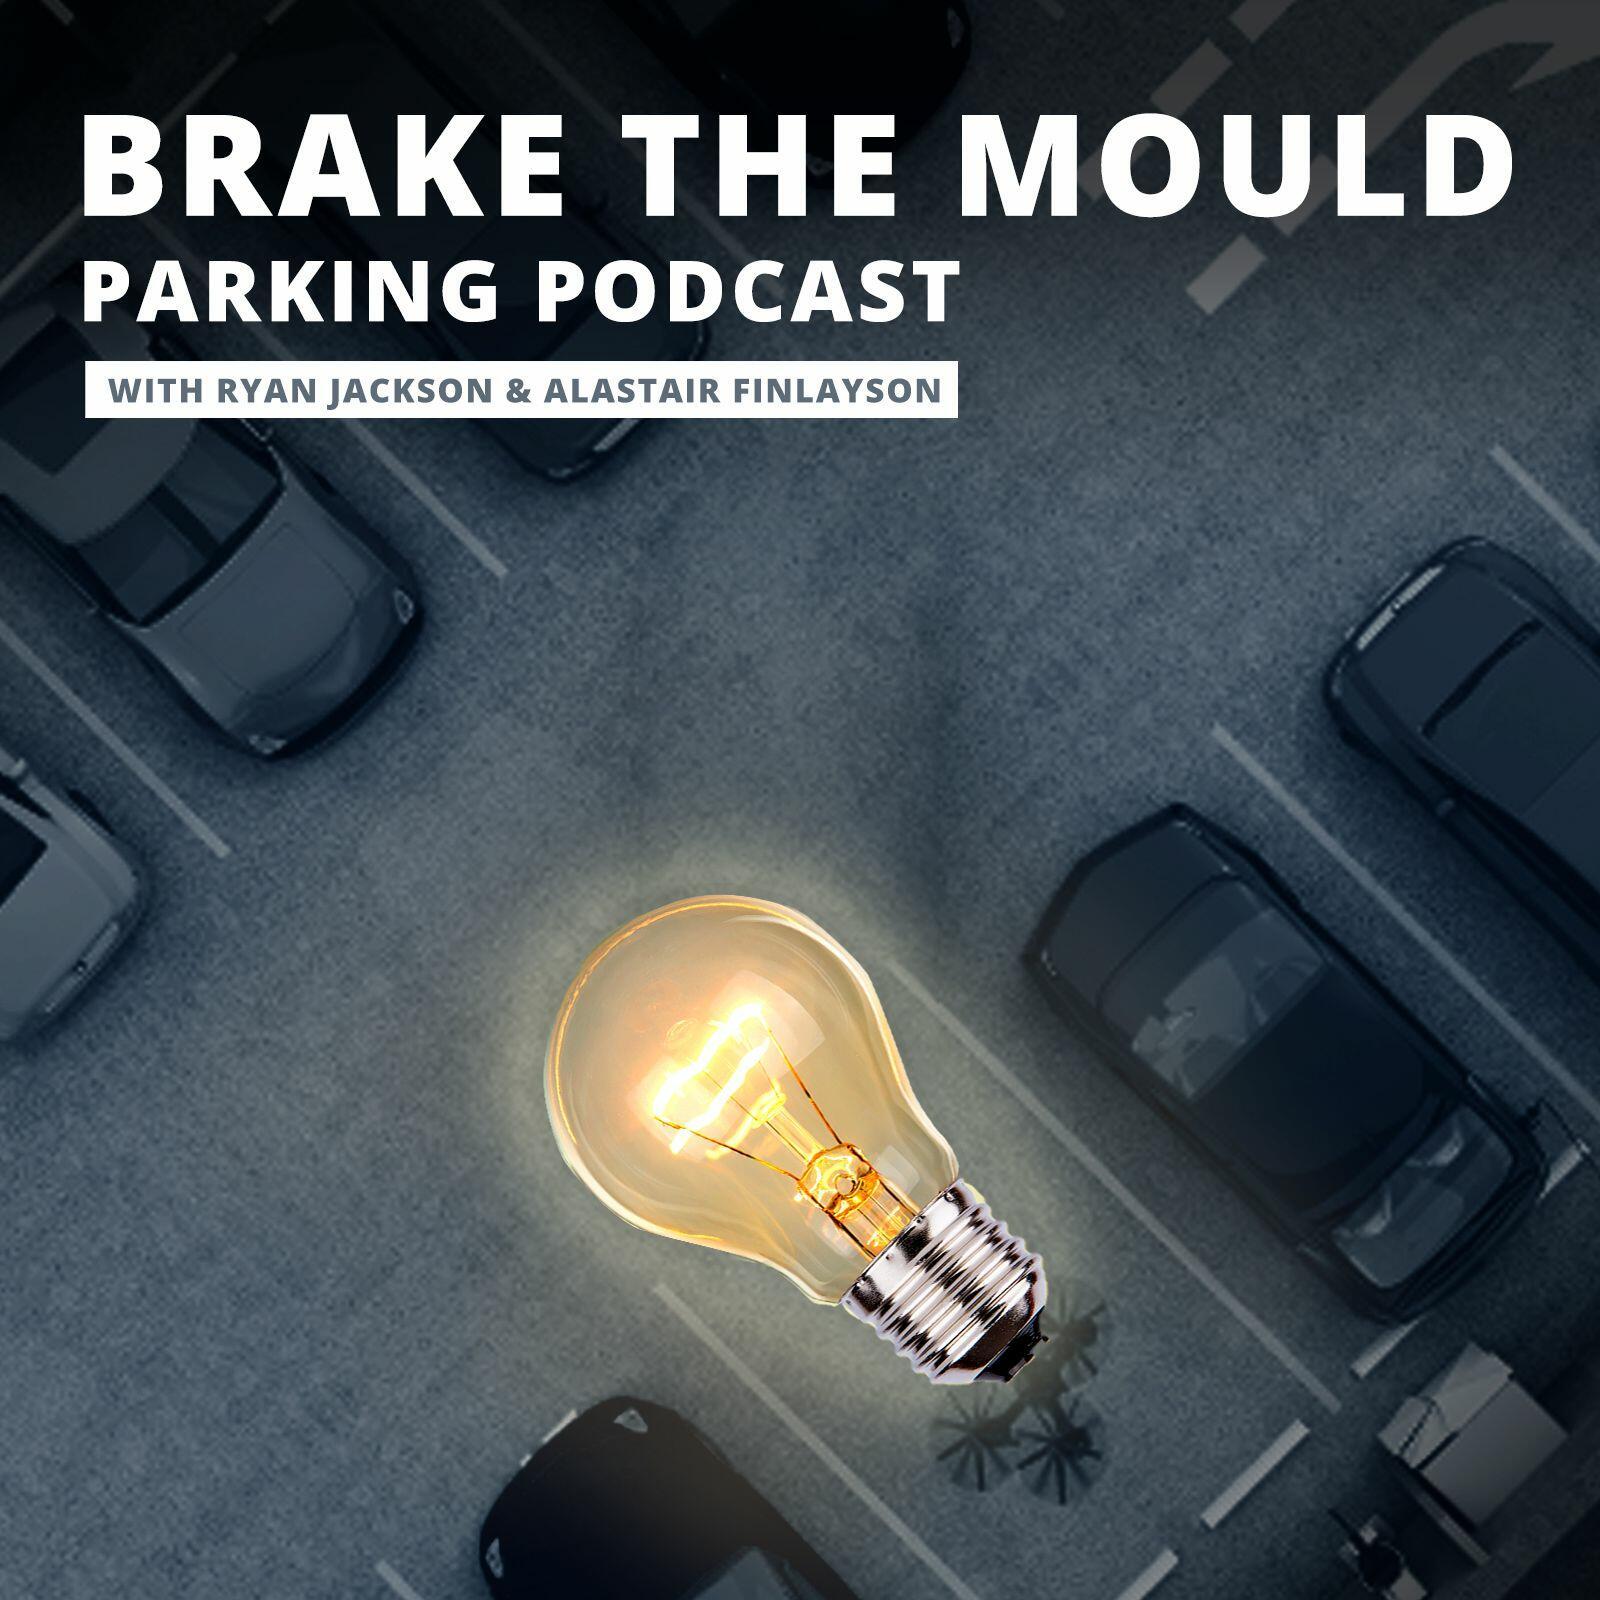 Brake The Mould Parking Podcast